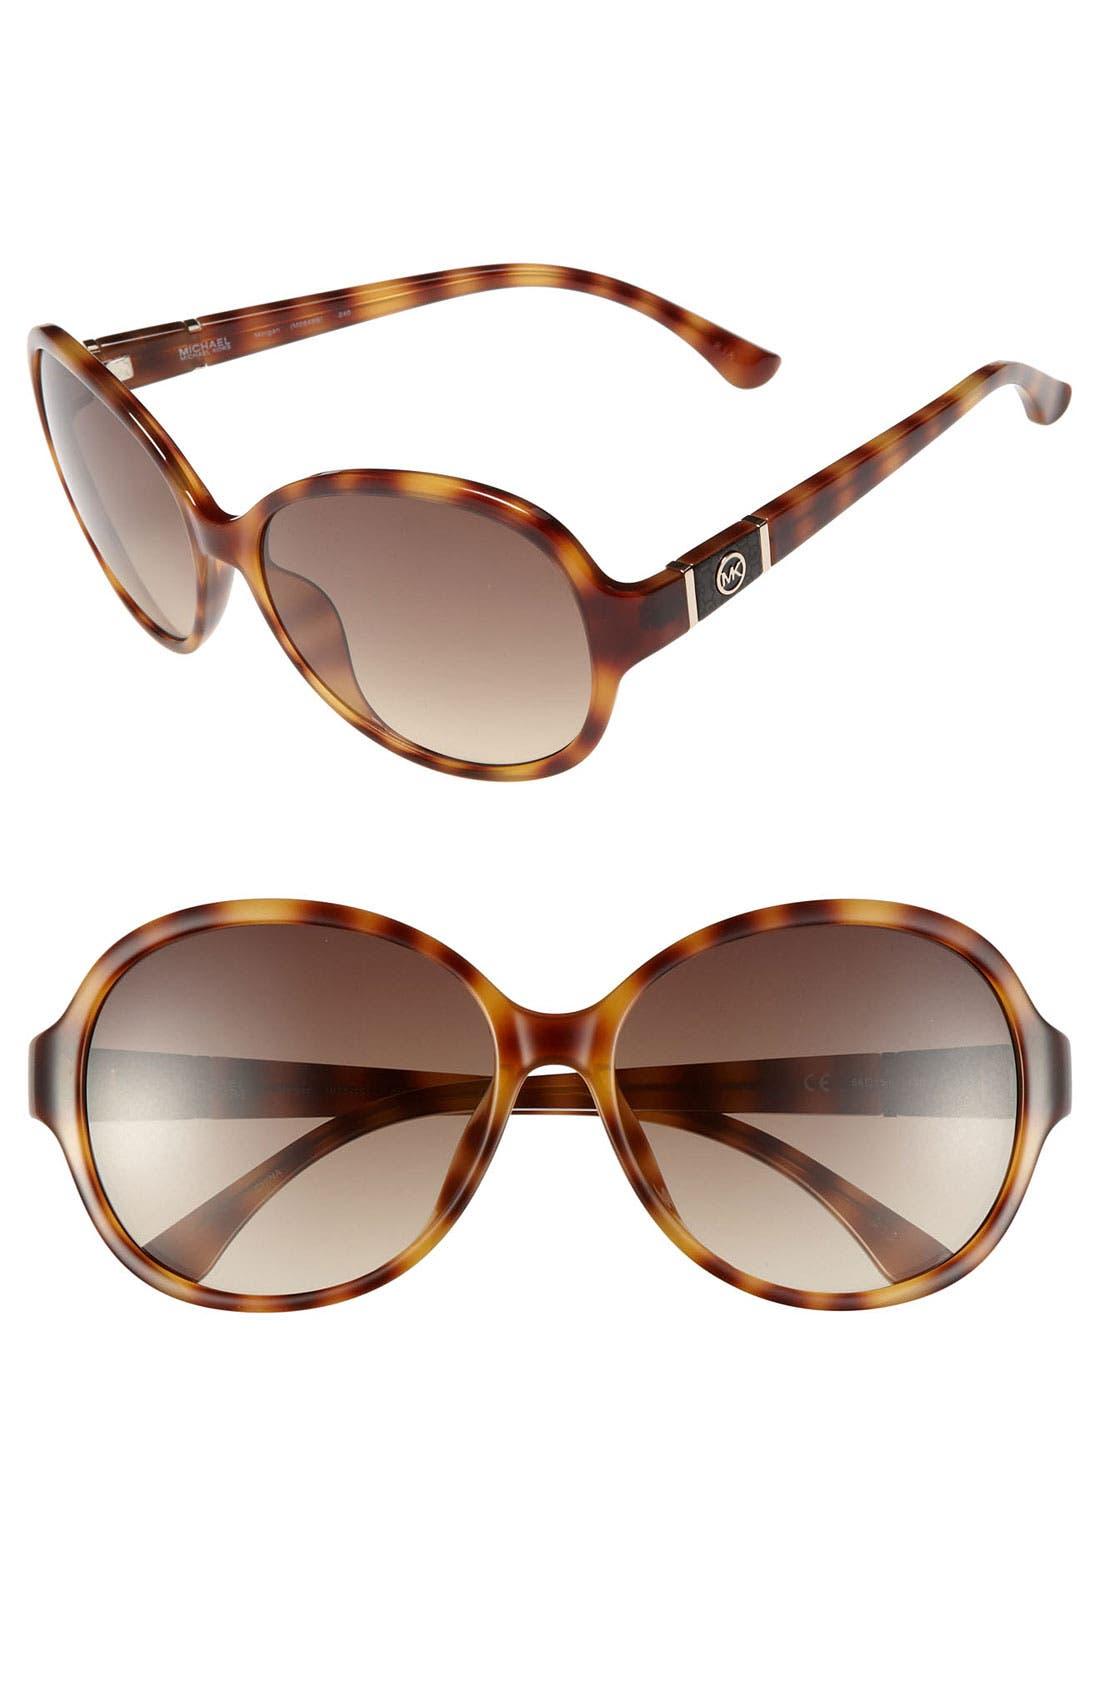 Alternate Image 1 Selected - MICHAEL Michael Kors 'Morgan' 58mm Sunglasses (Online Only)